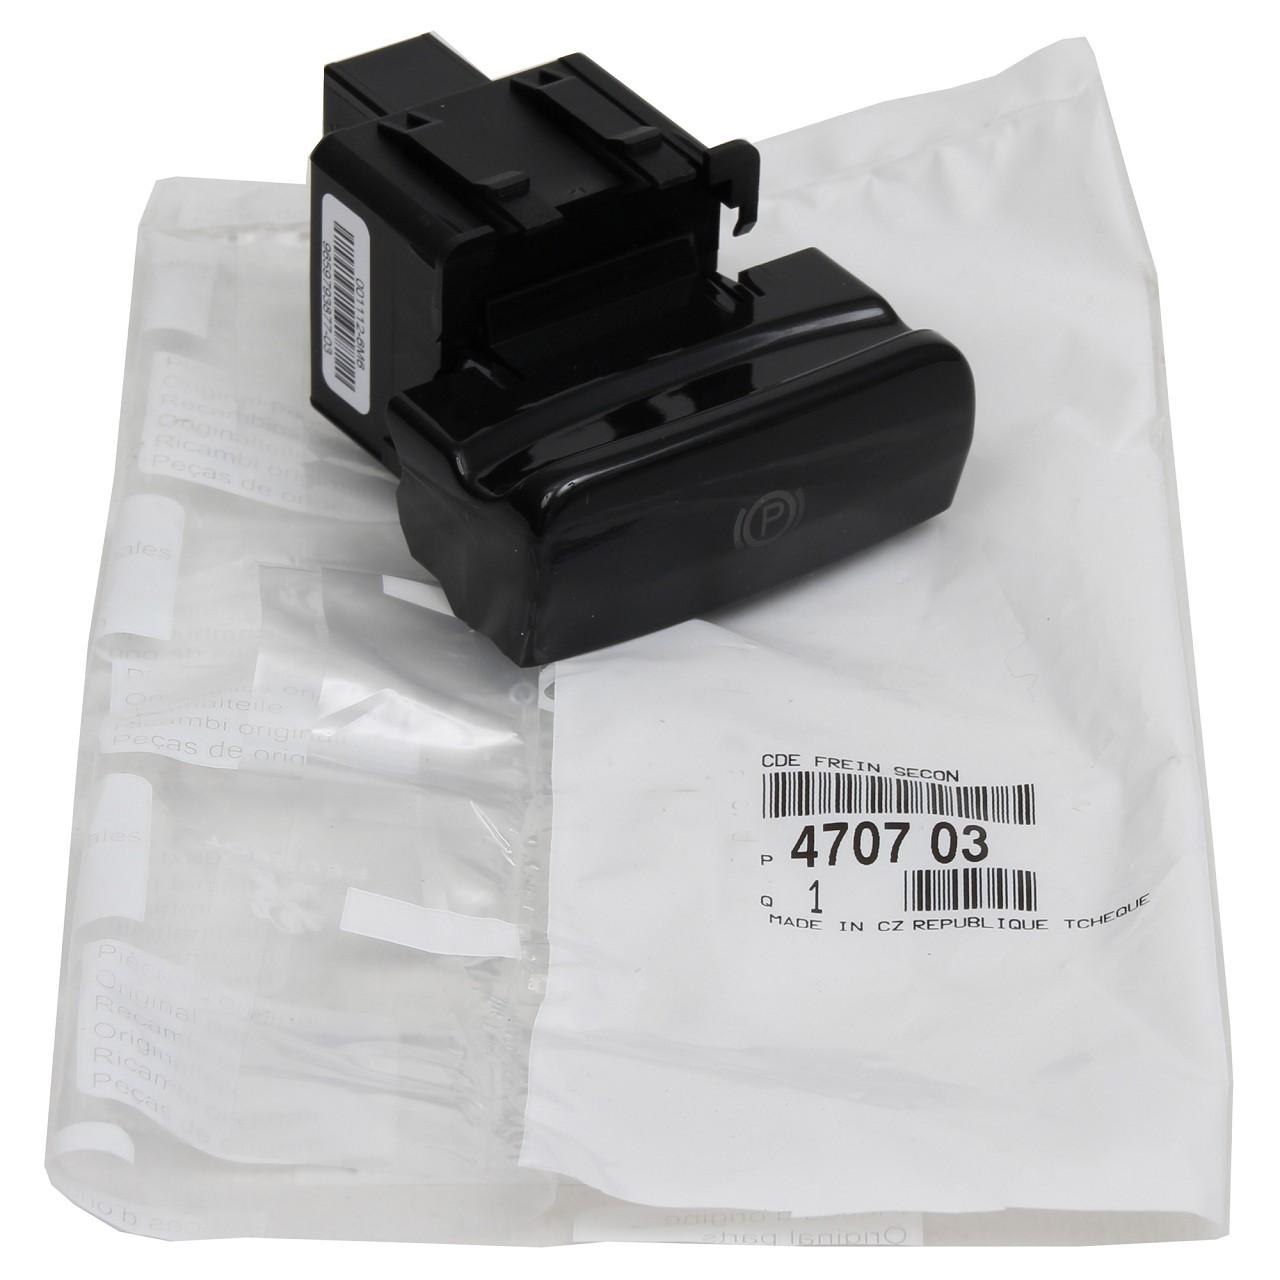 ORIGINAL Citroen Schalter Feststellbremse C4 II C4 PICASSO I DS4 4707.03S